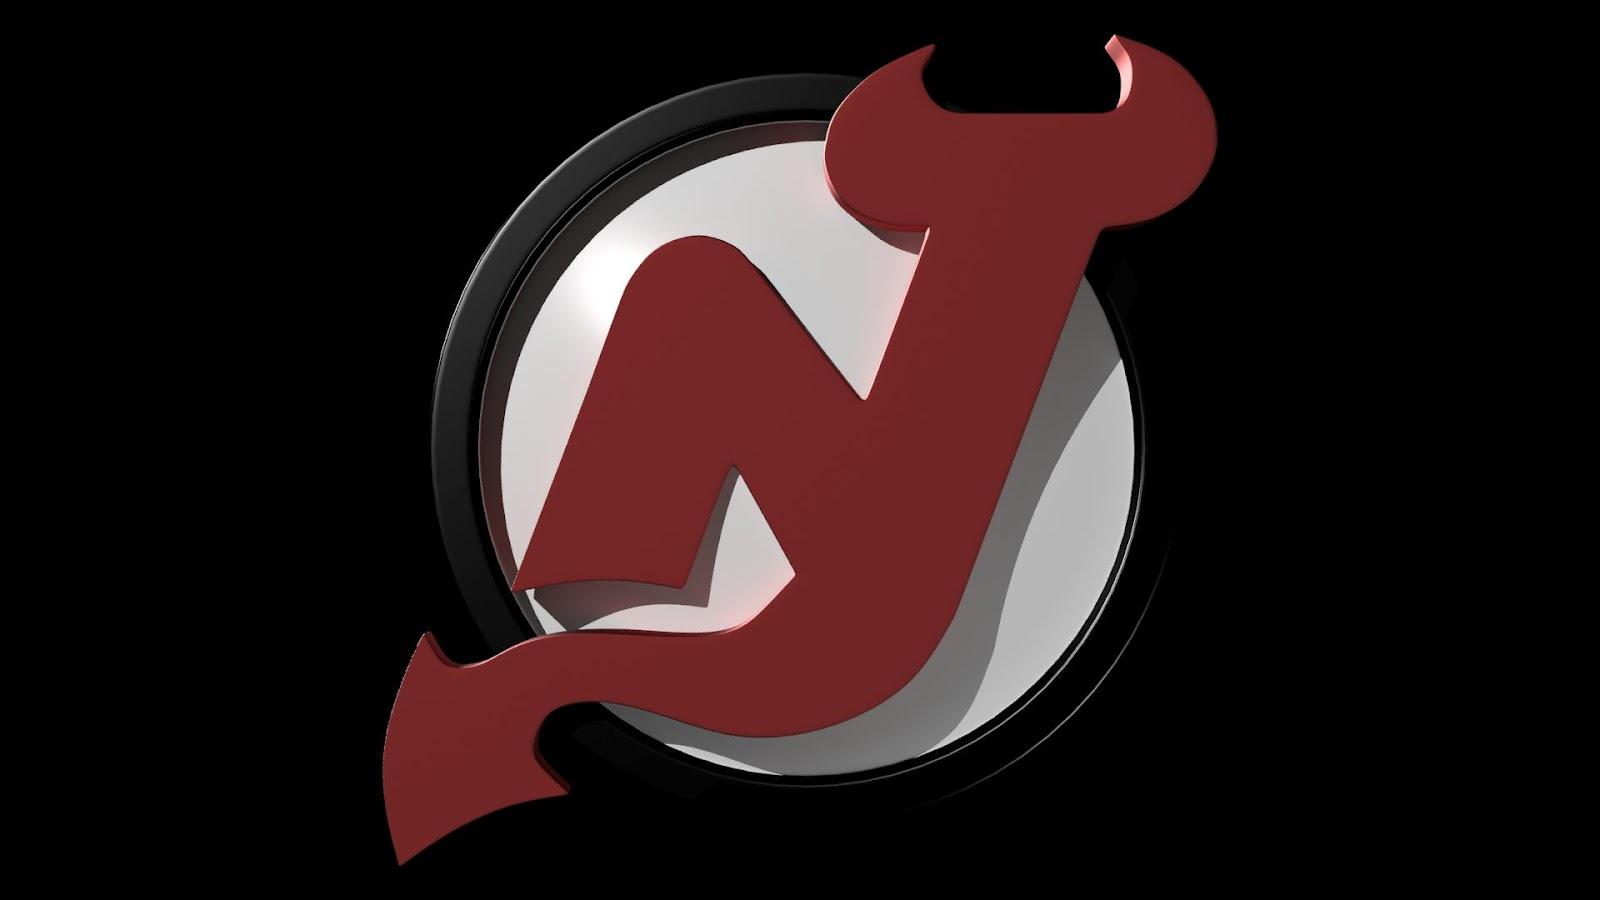 Franks art blog new jersey devils logo and new interest new jersey devils logo and new interest voltagebd Gallery